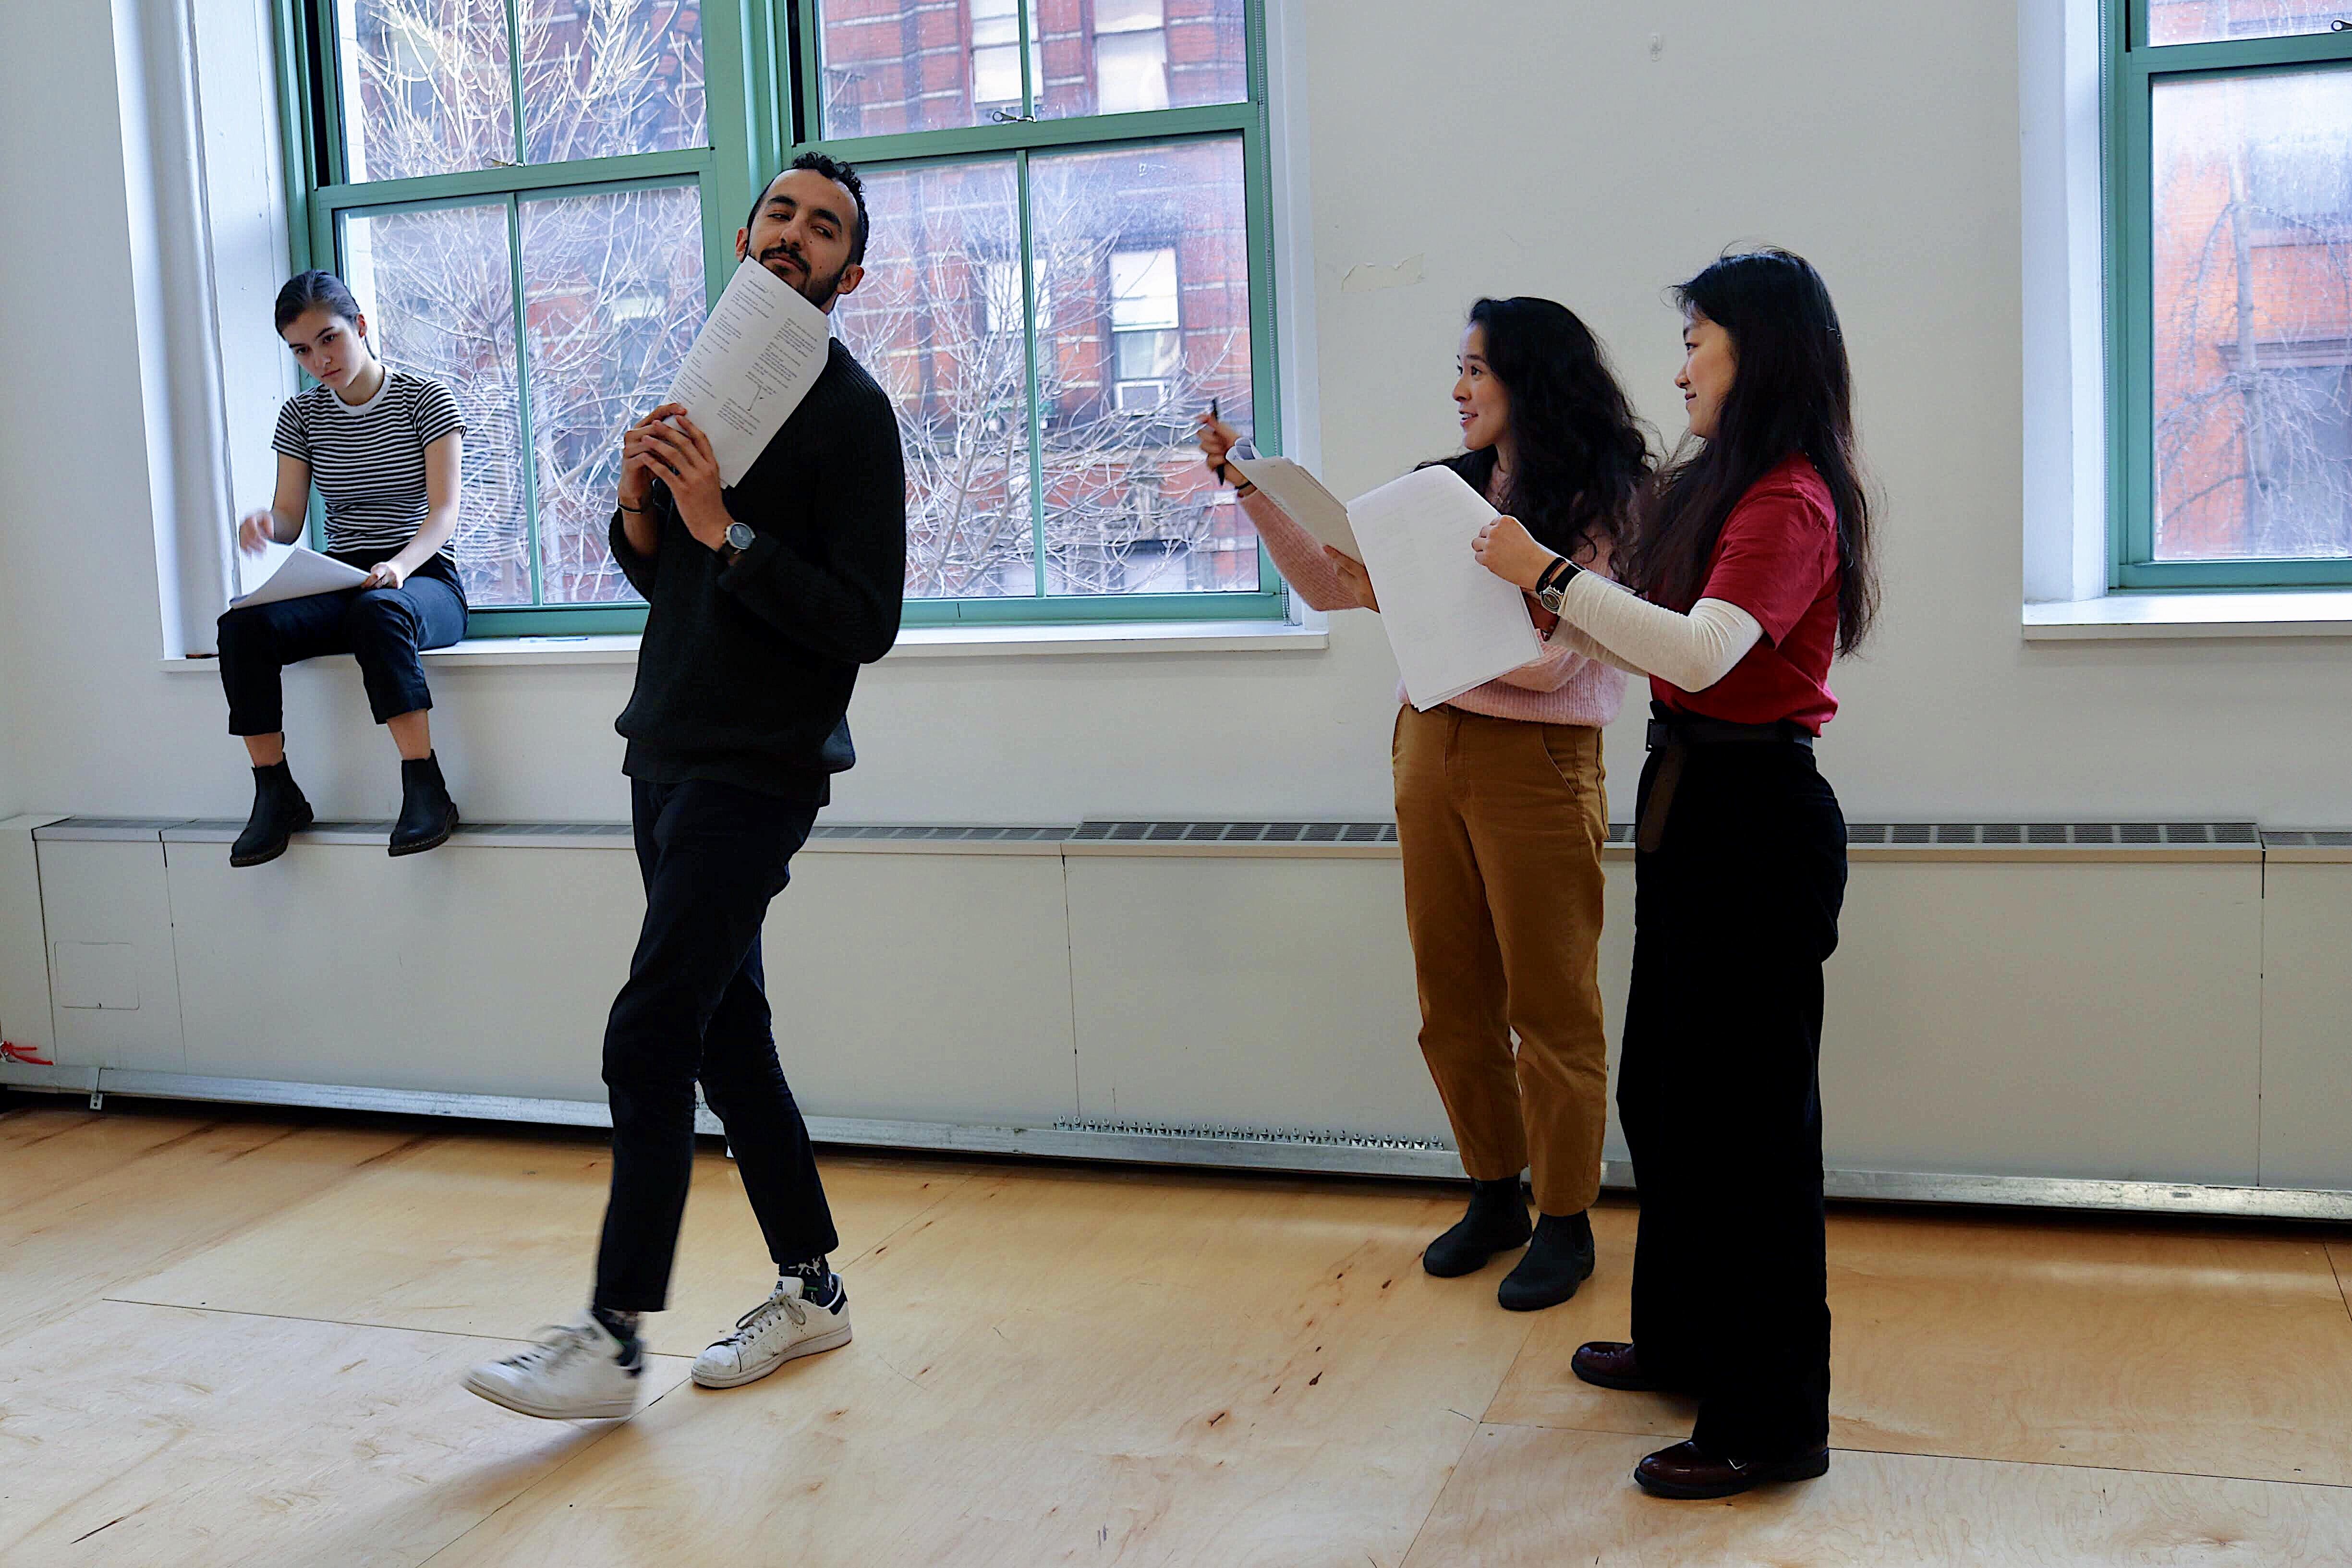 Francisco Alvidrez, Sophie Gorai, Jojo Guo